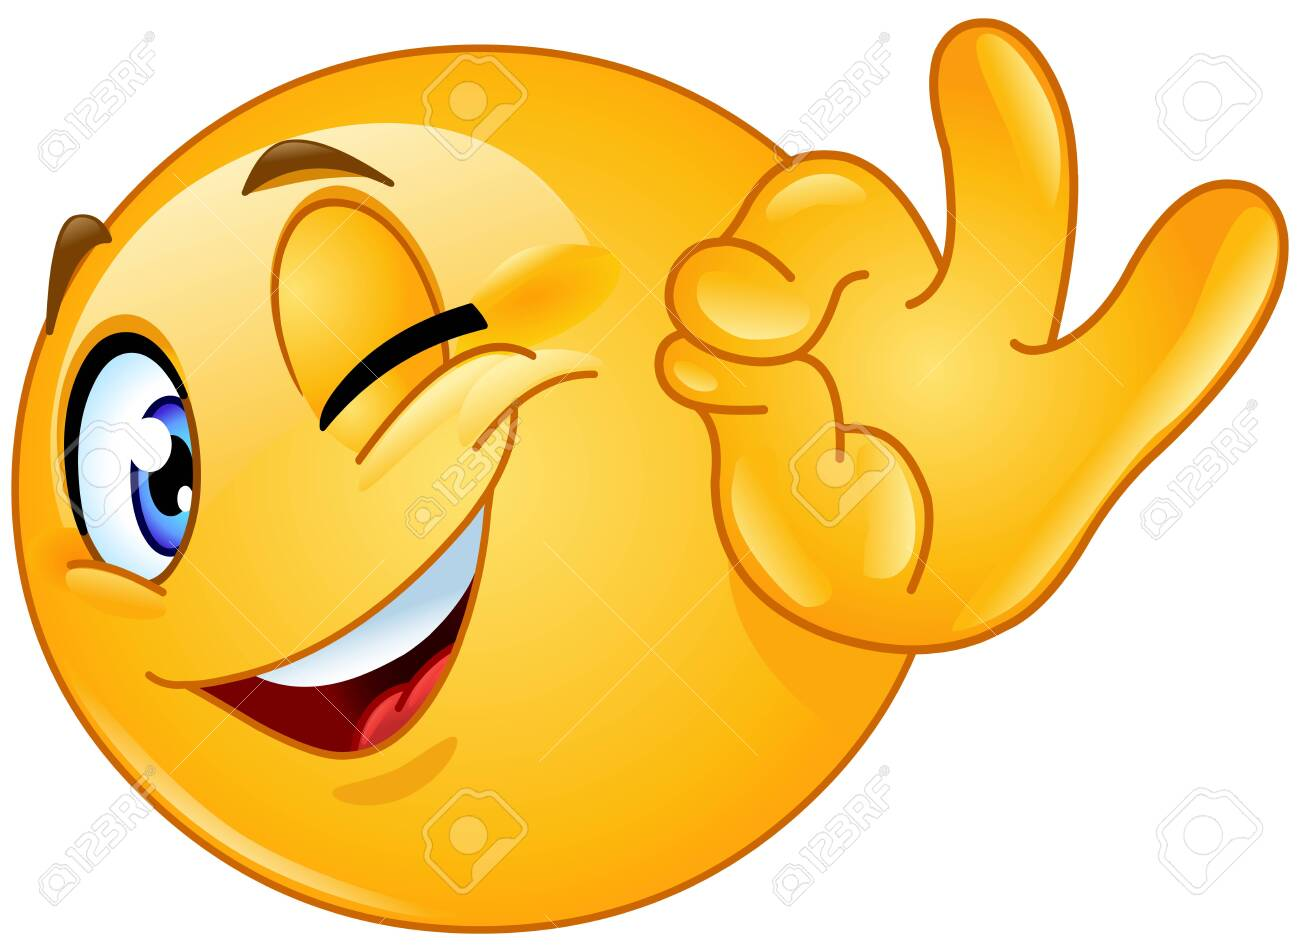 Winking emoticon showing ok sign - 124297445